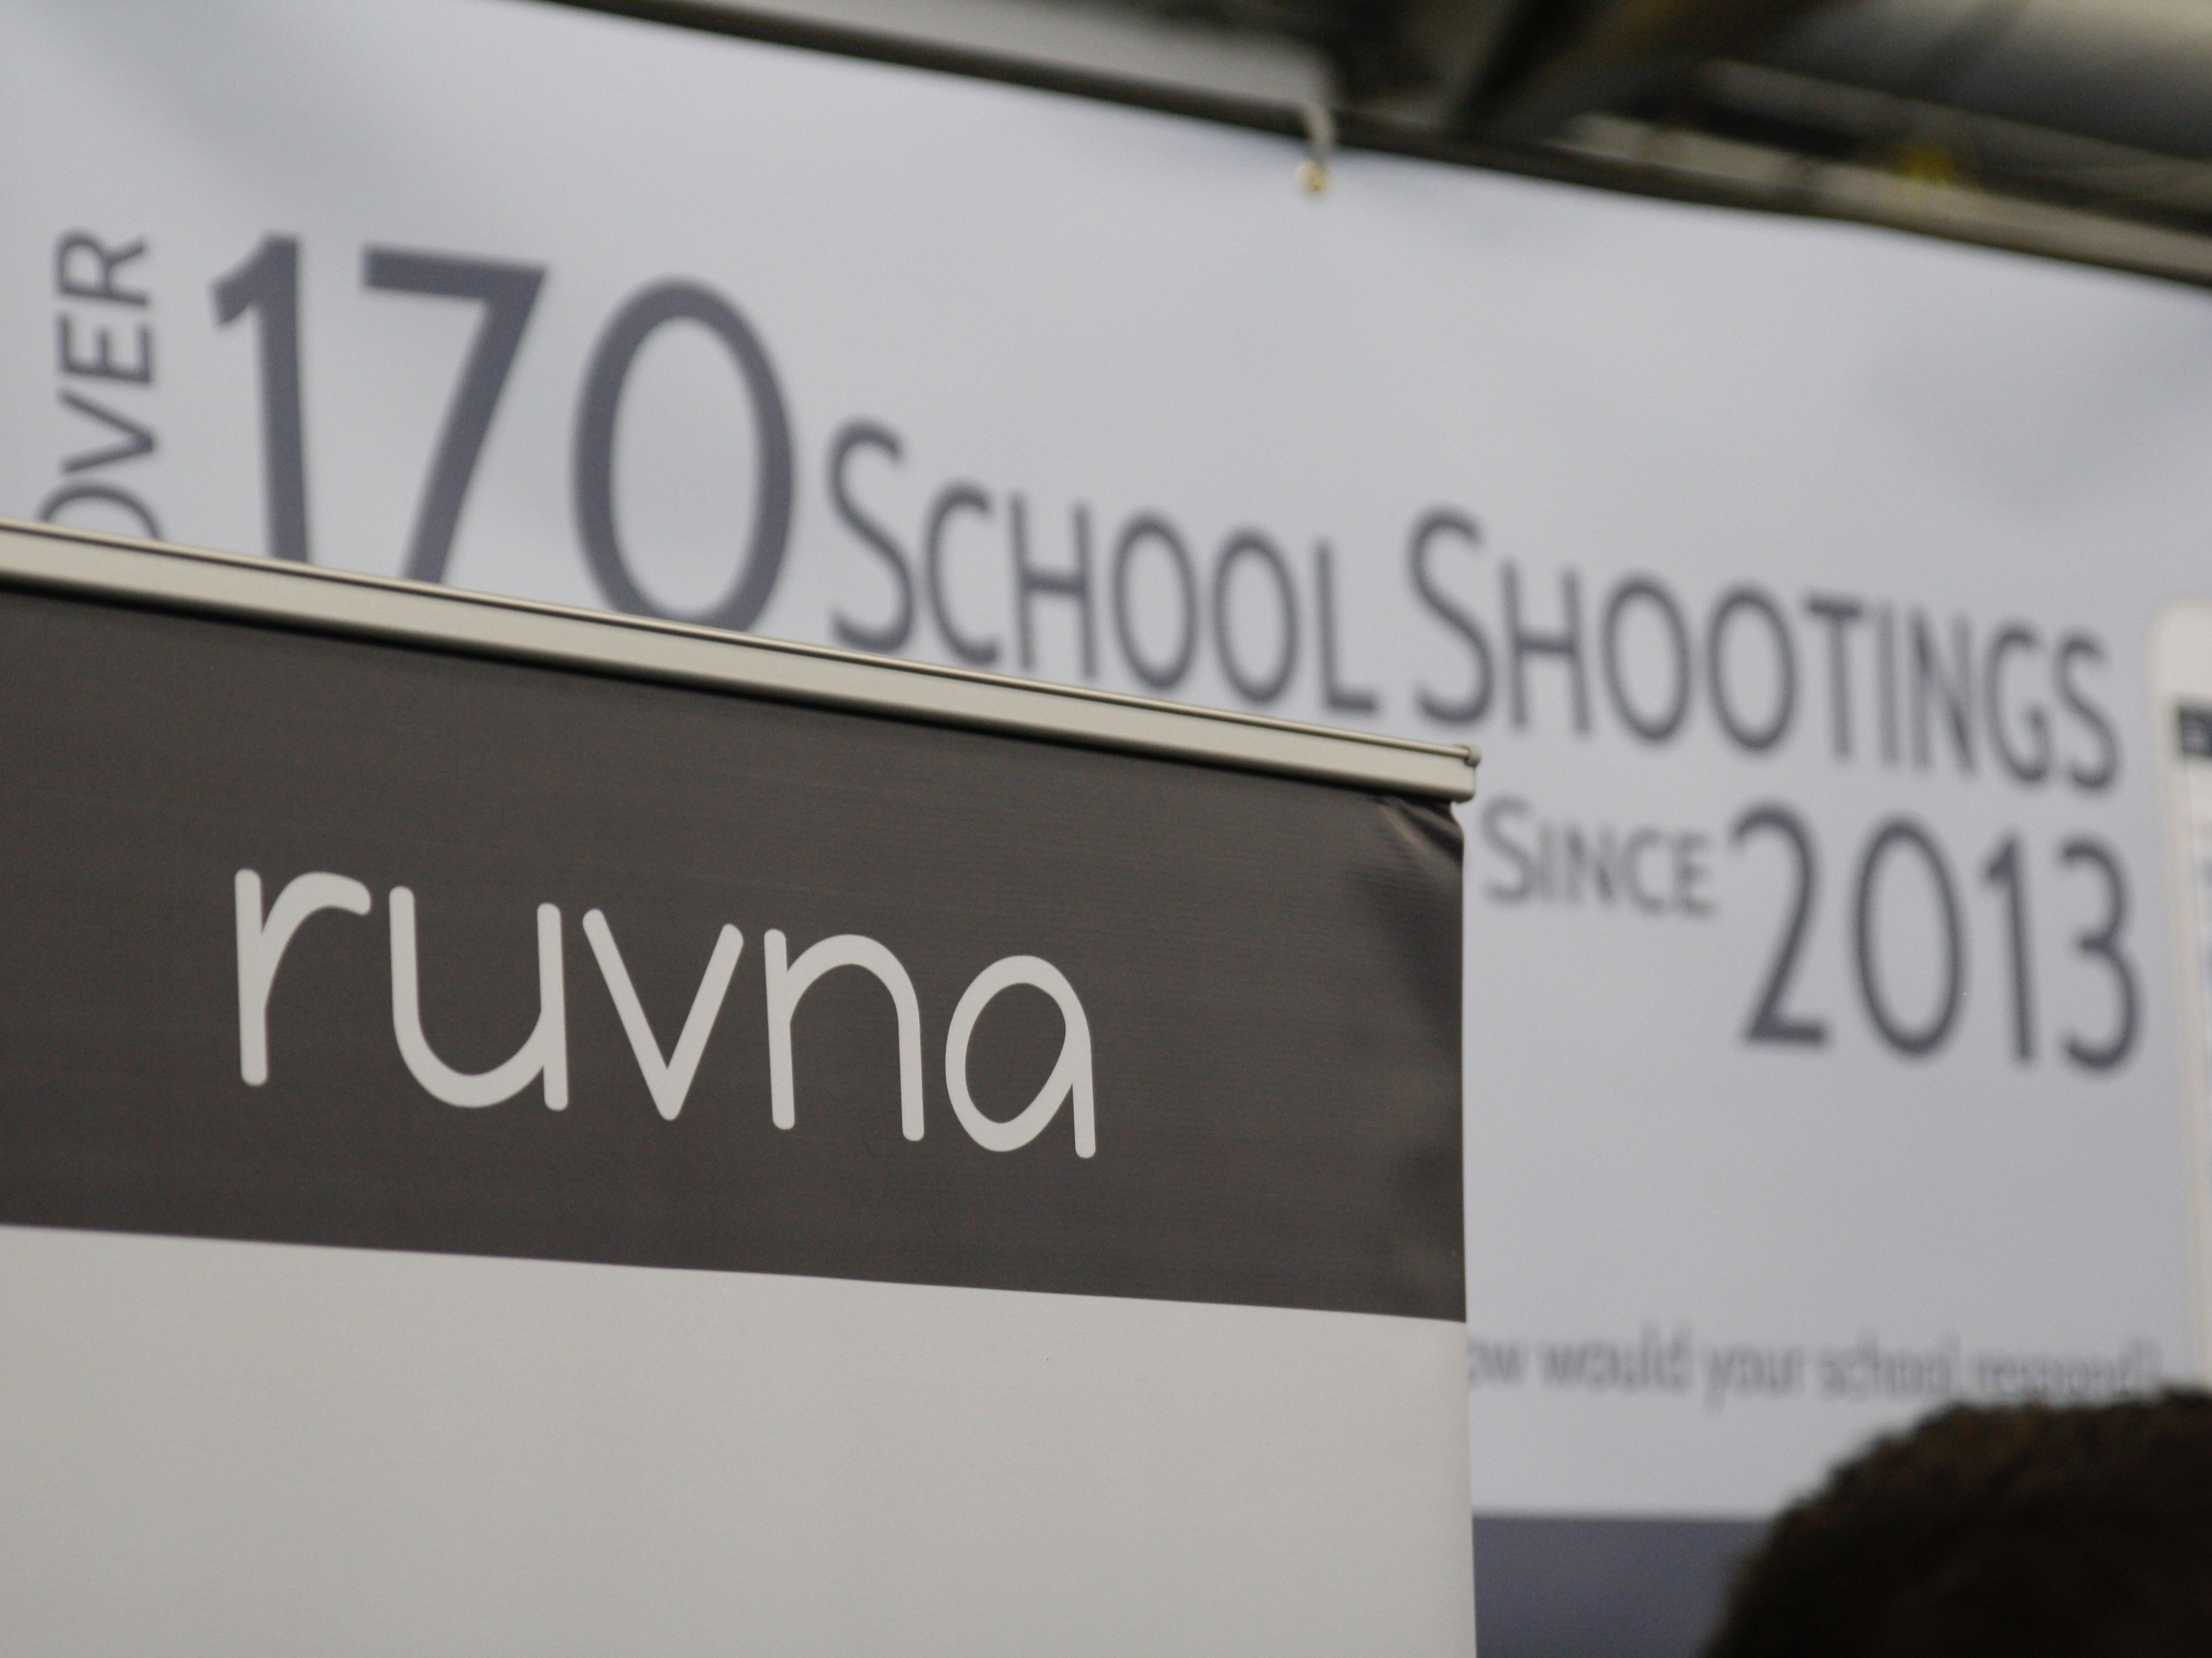 Ruvna Smartphone App Wants to Protect Schools in Shootings